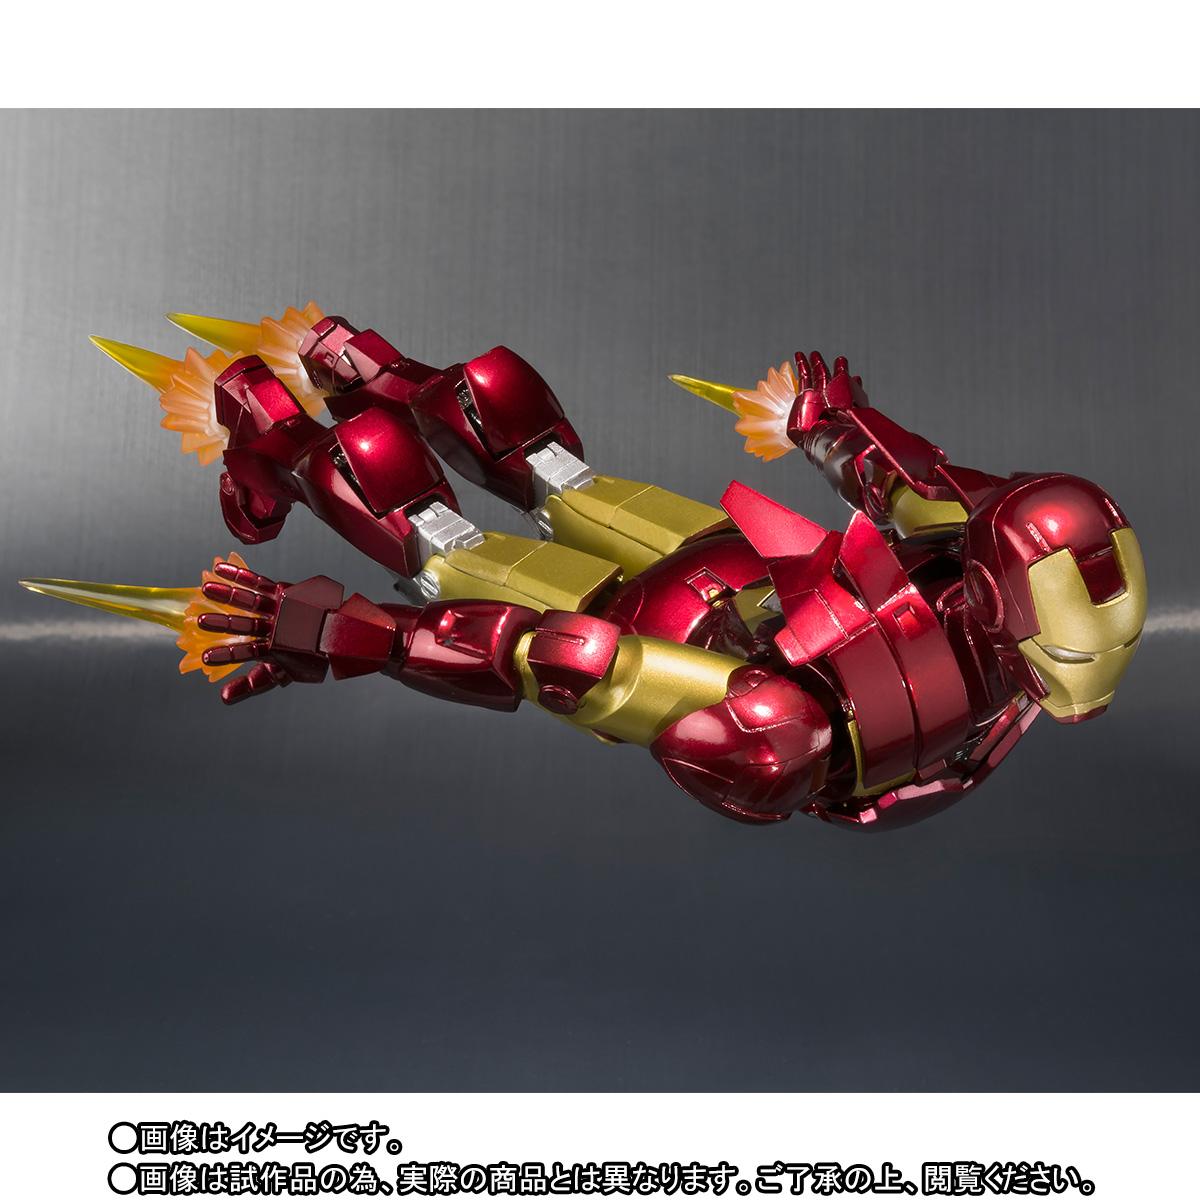 [Comentários] Marvel S.H.Figuarts - Página 2 ZBkloFX1